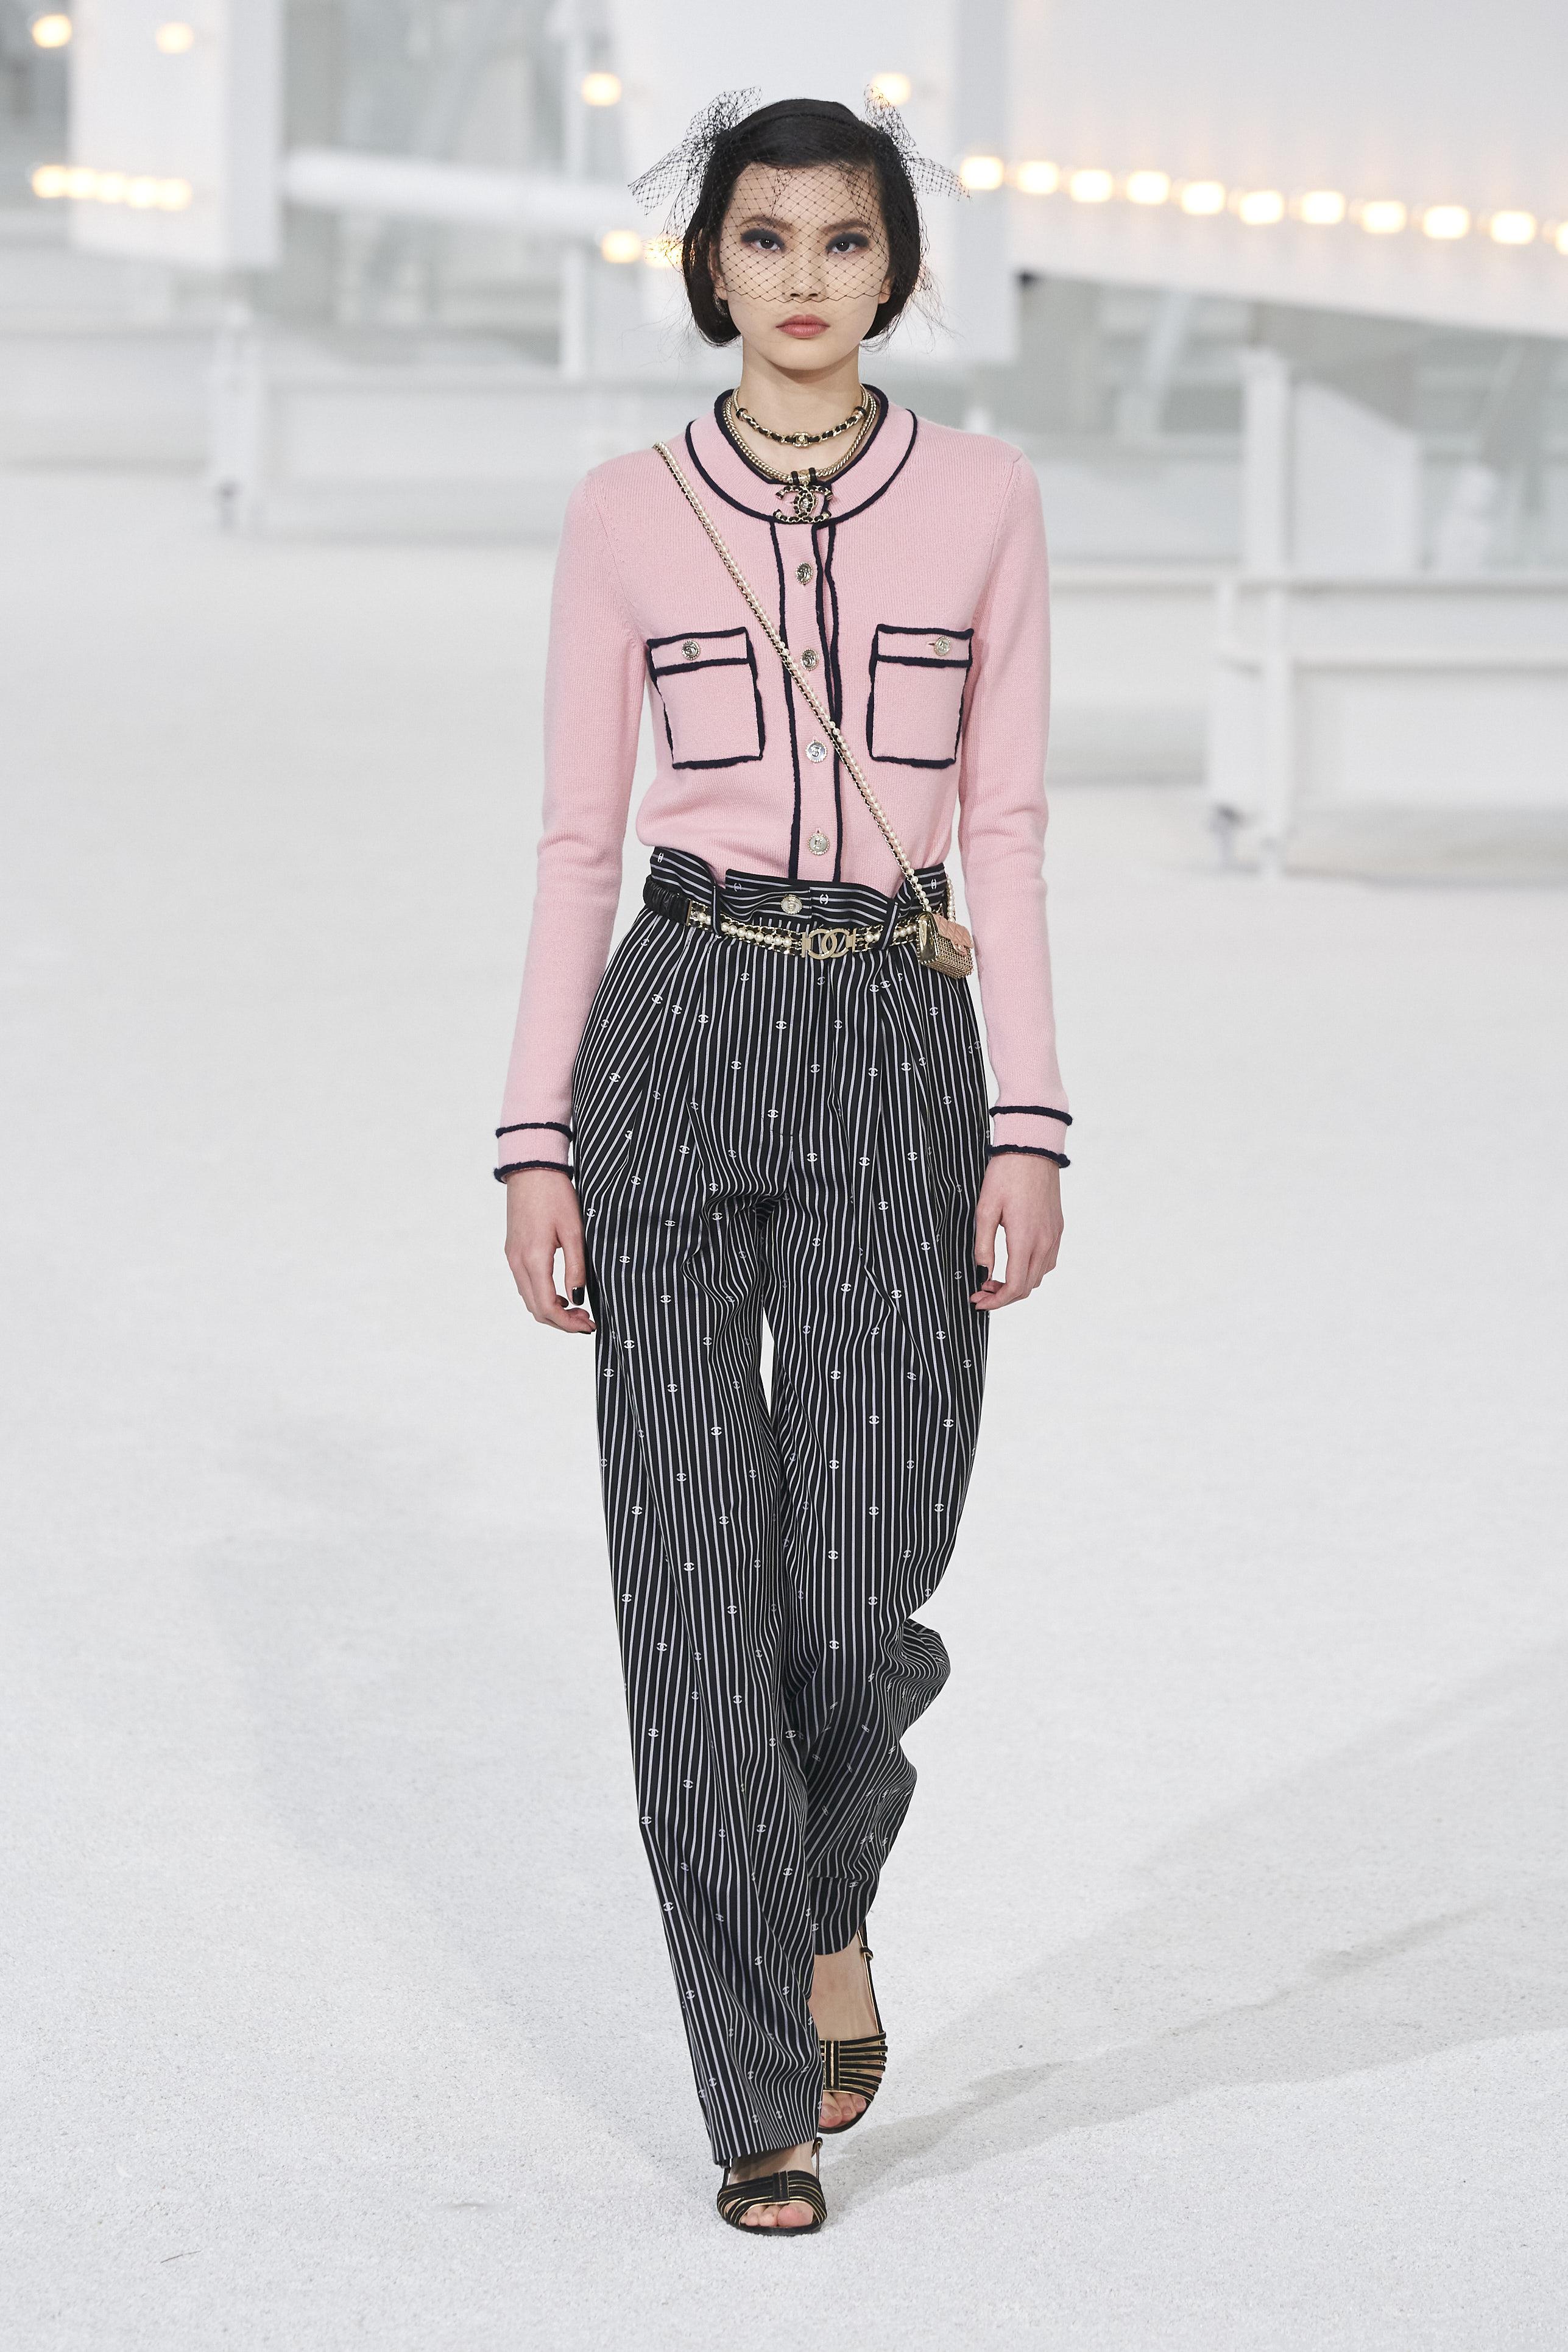 Chanel Spring 2021 Fashion Show Photos